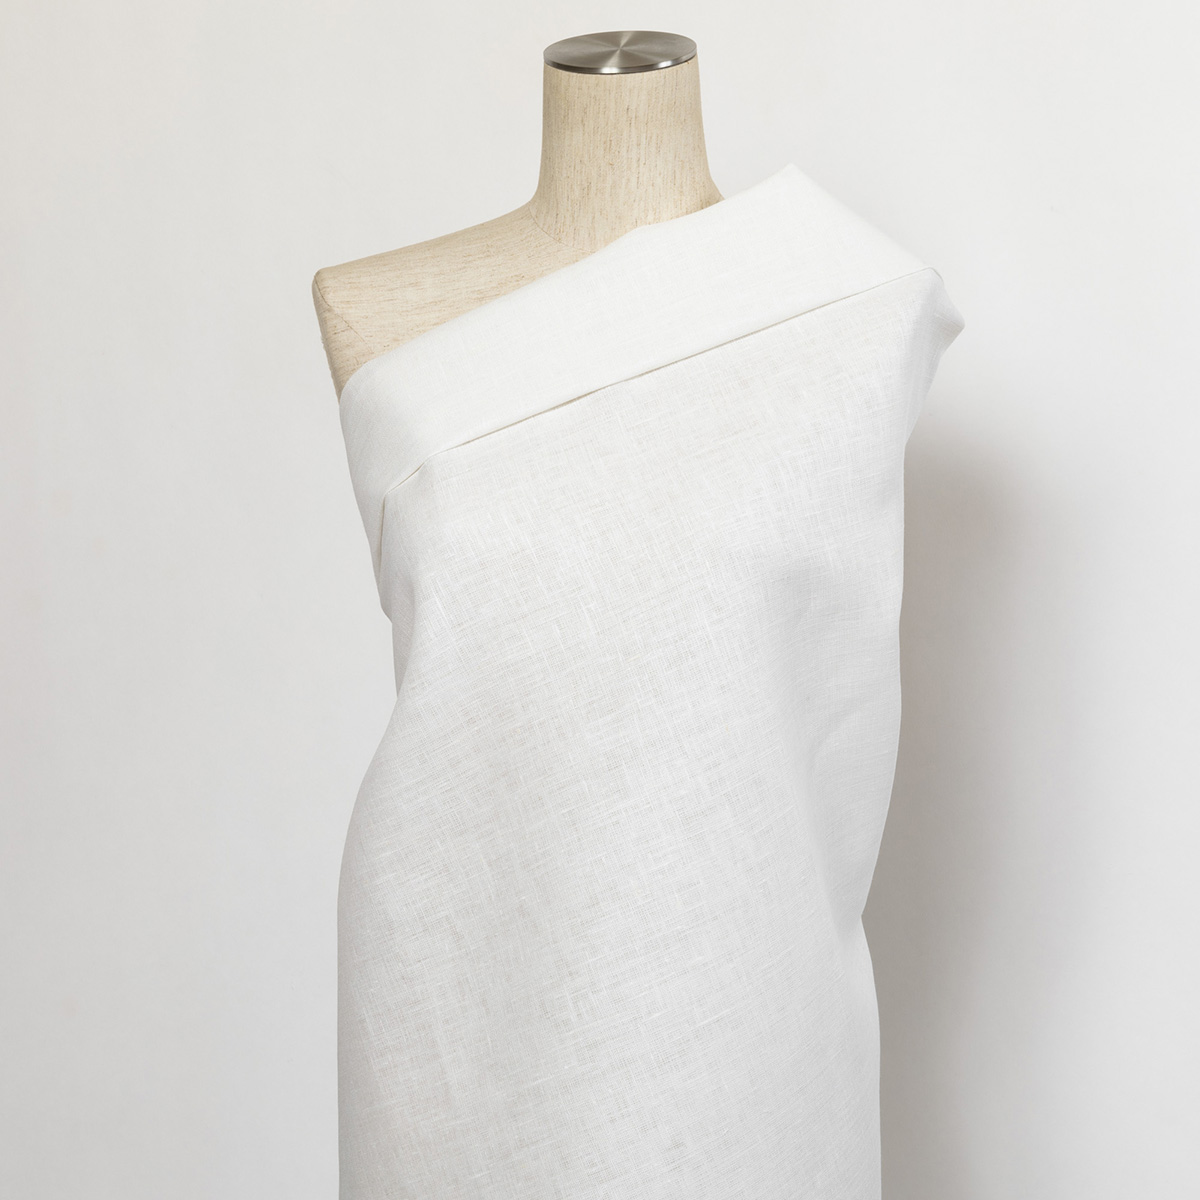 220cm巾 【 リネン 100%生地】 ホワイト 無地 中厚地 1m単位 R1797 <旧品番 W-7971> 【ワンピース、スカート、シーツ、カーテンに最適】